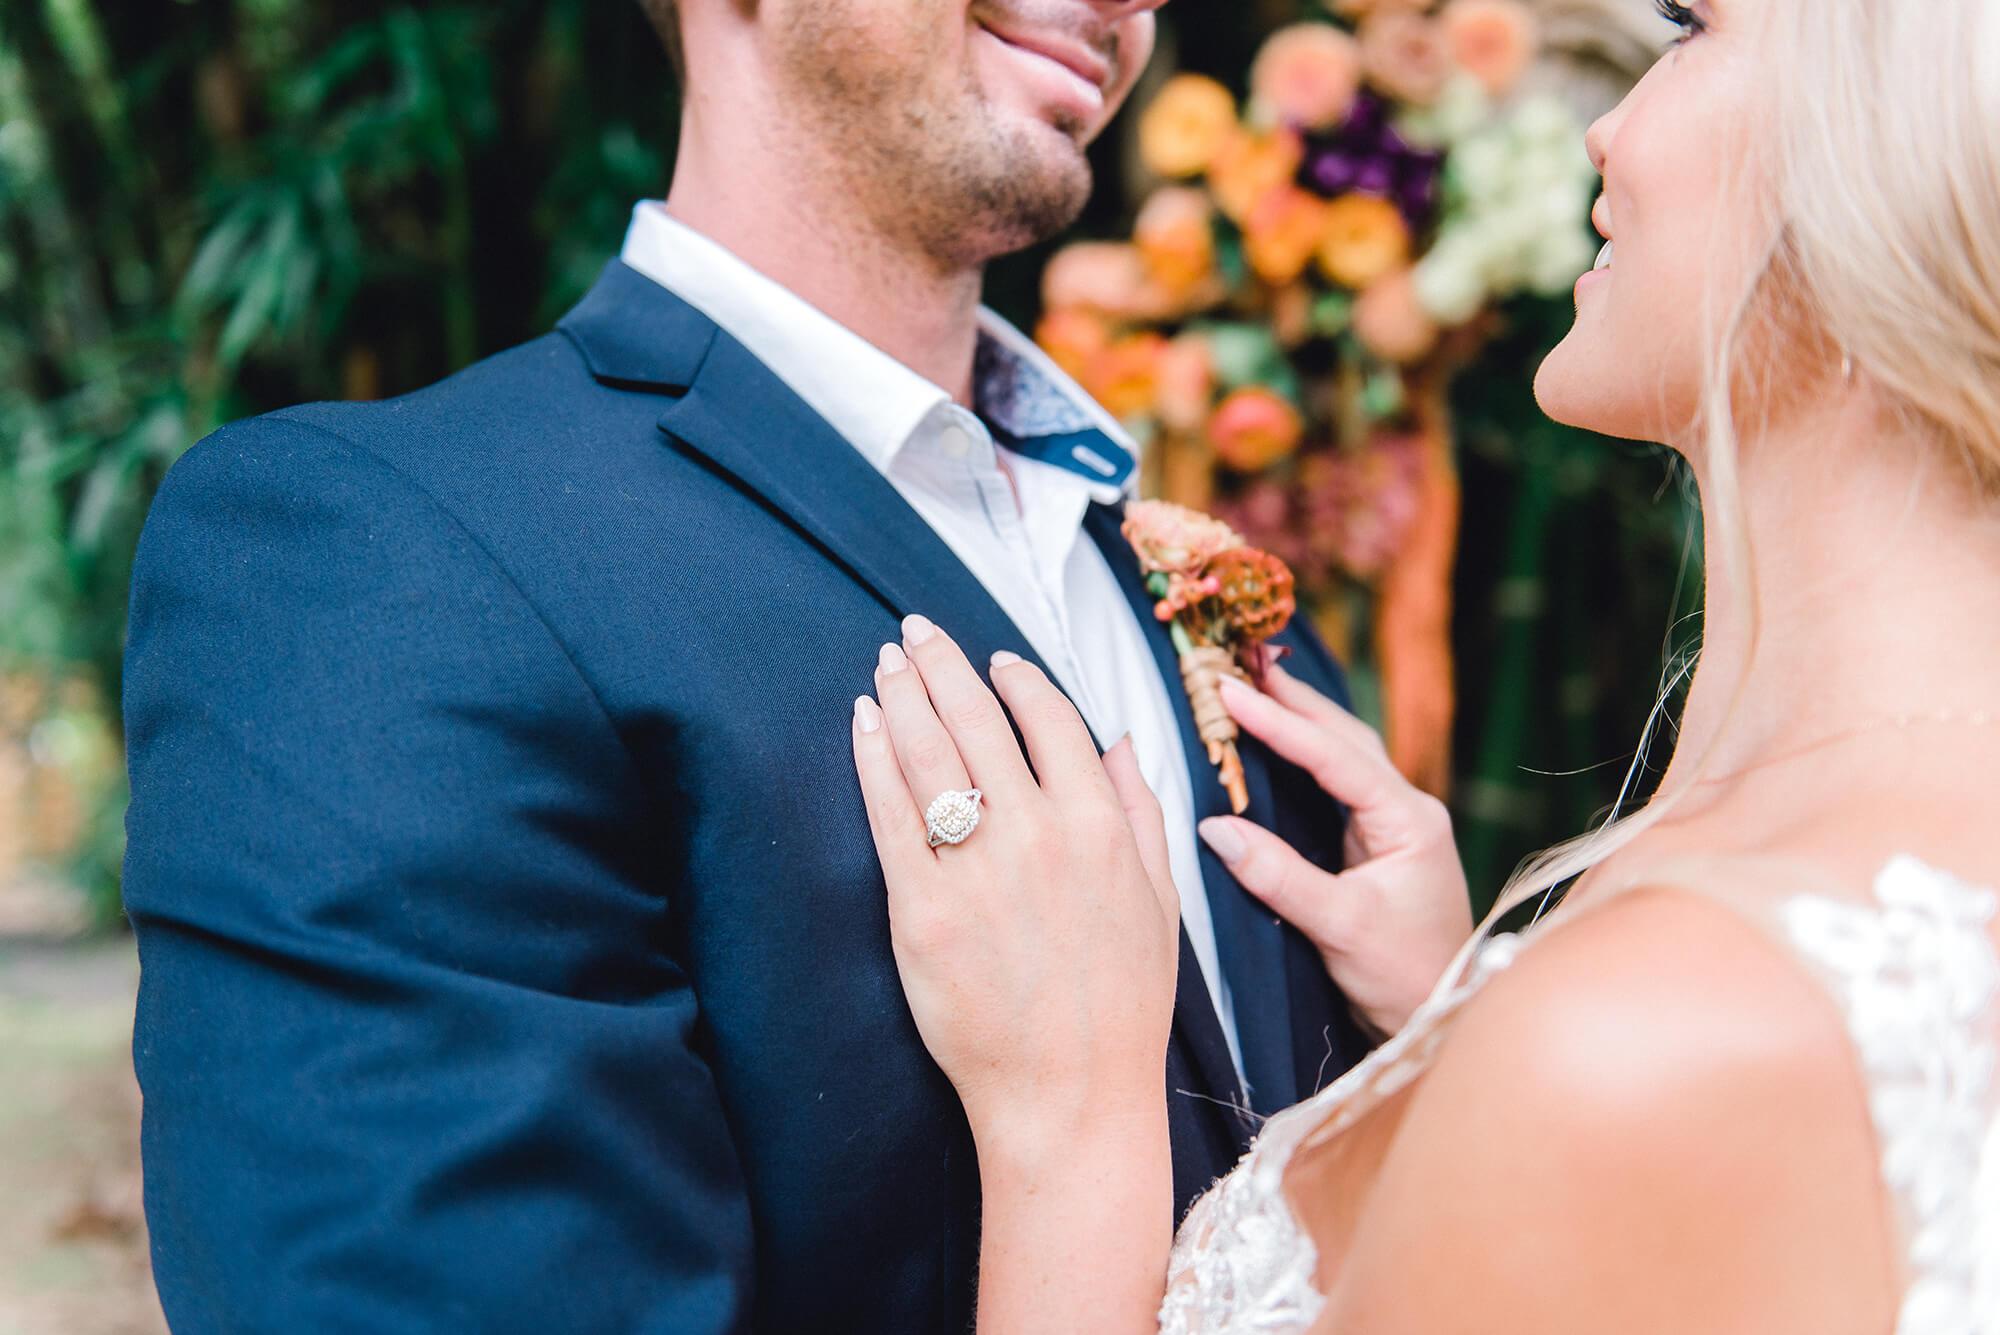 Love-Lara-Jewellery-Designer-Wedding-Engagement-Rings